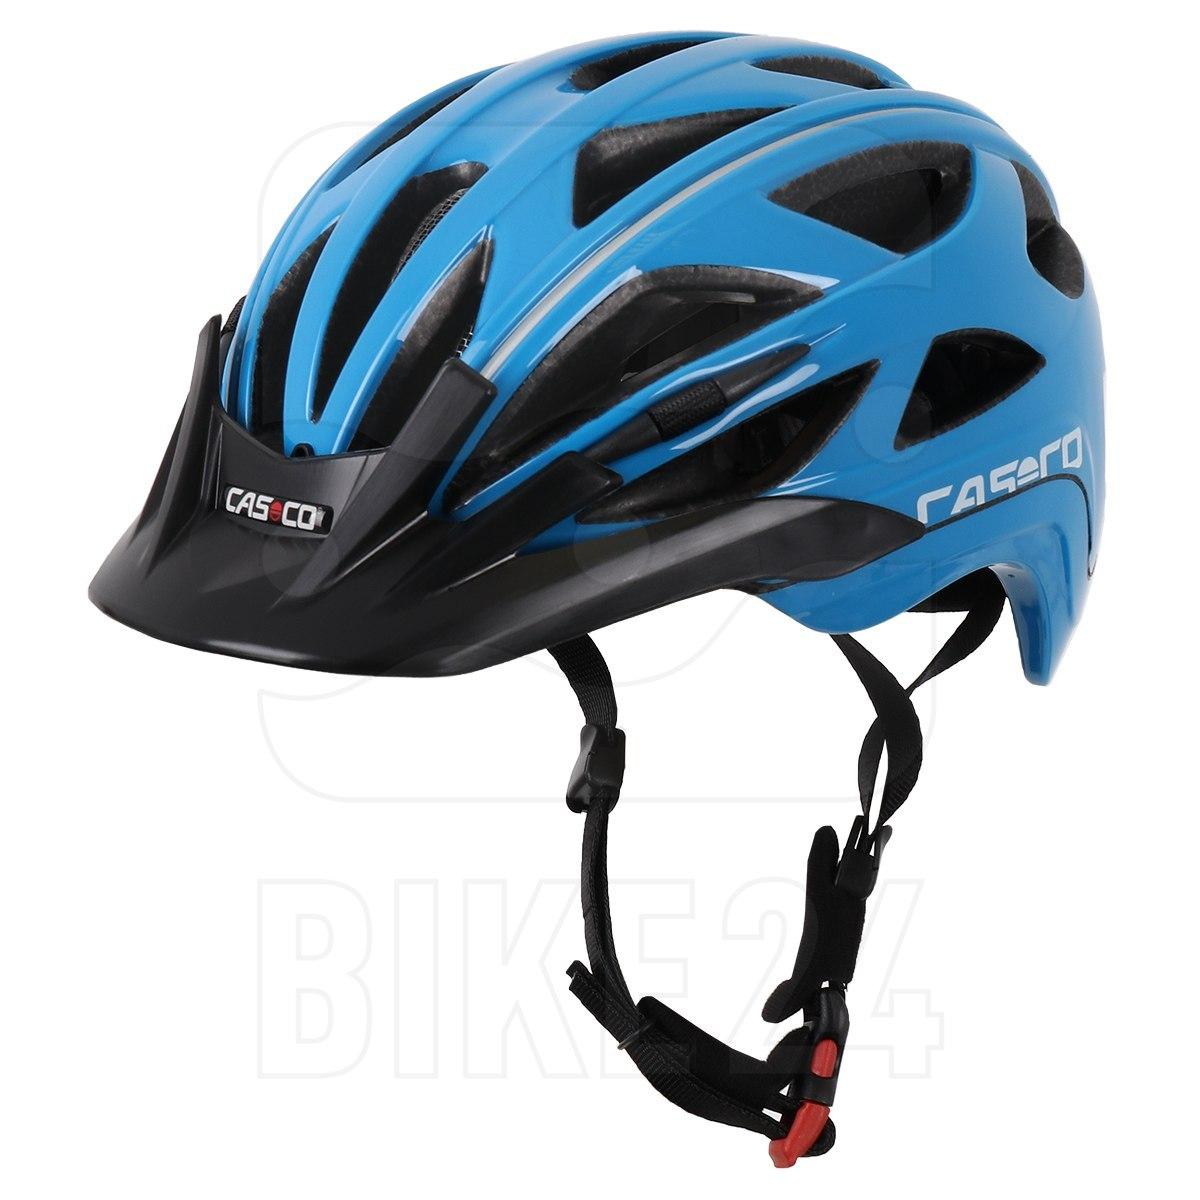 Casco Activ 2 Junior Kids Helmet - blue